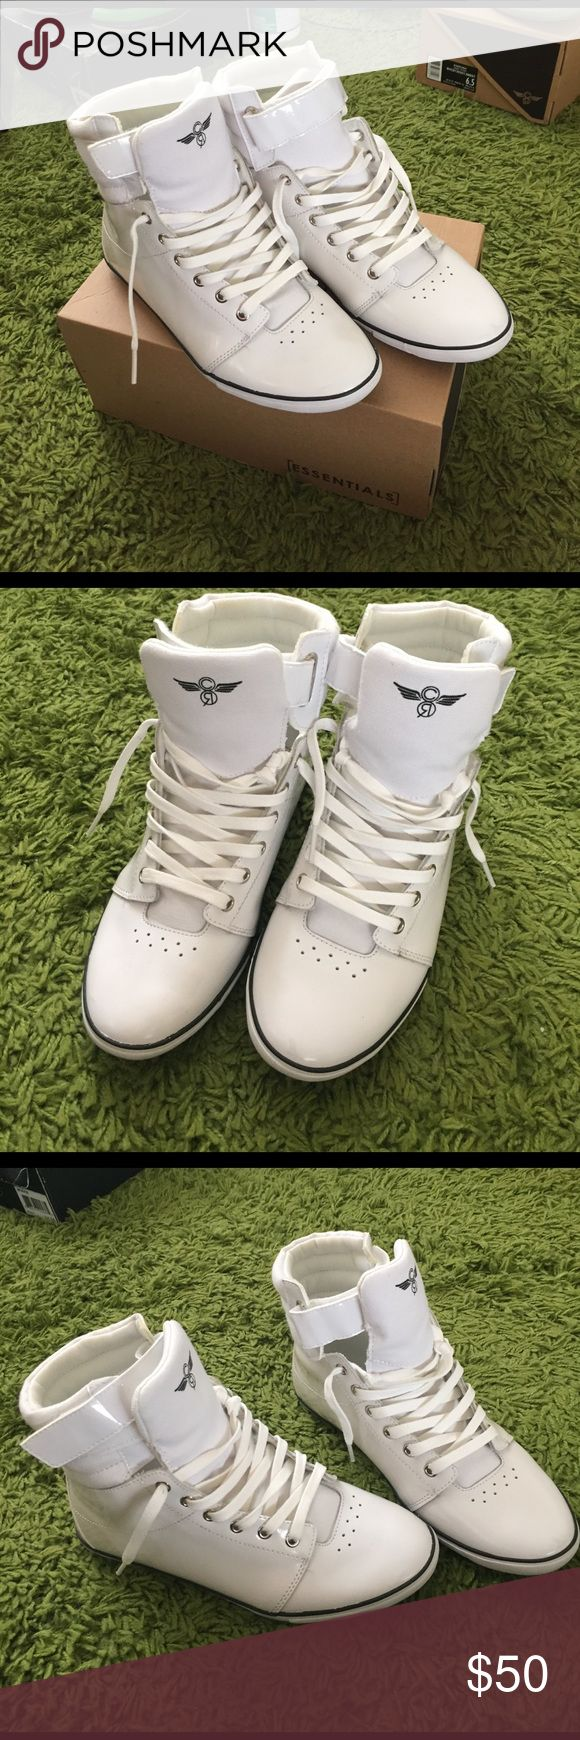 Creative Recreation White high top sneakers White high top sneakers with ankle strap. Like new; worn only once. Creative Recreation Shoes Sneakers